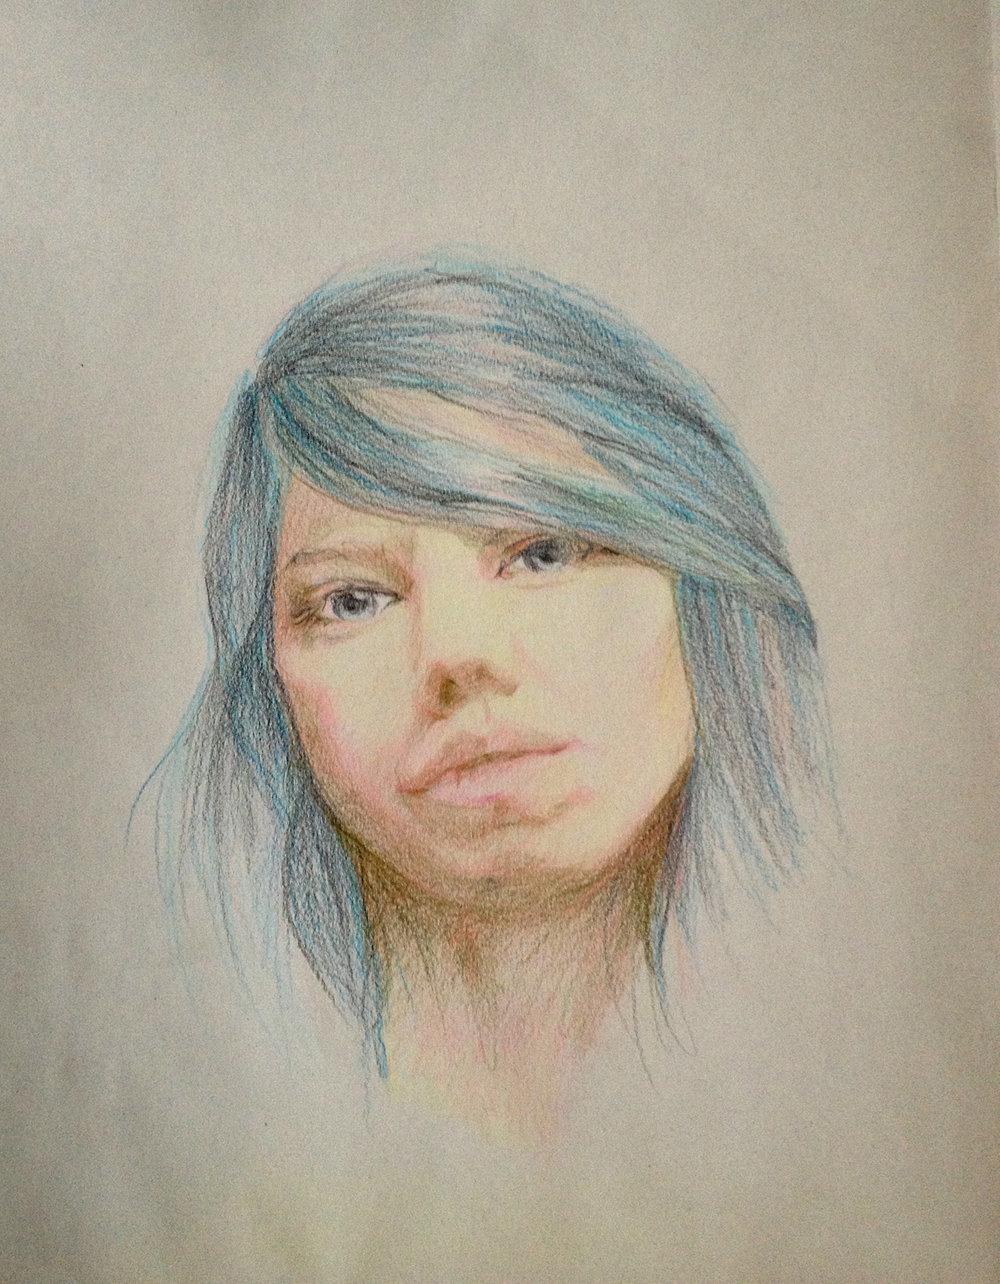 Self Portrait, 2012,colored pencil on paper,500x700 mm